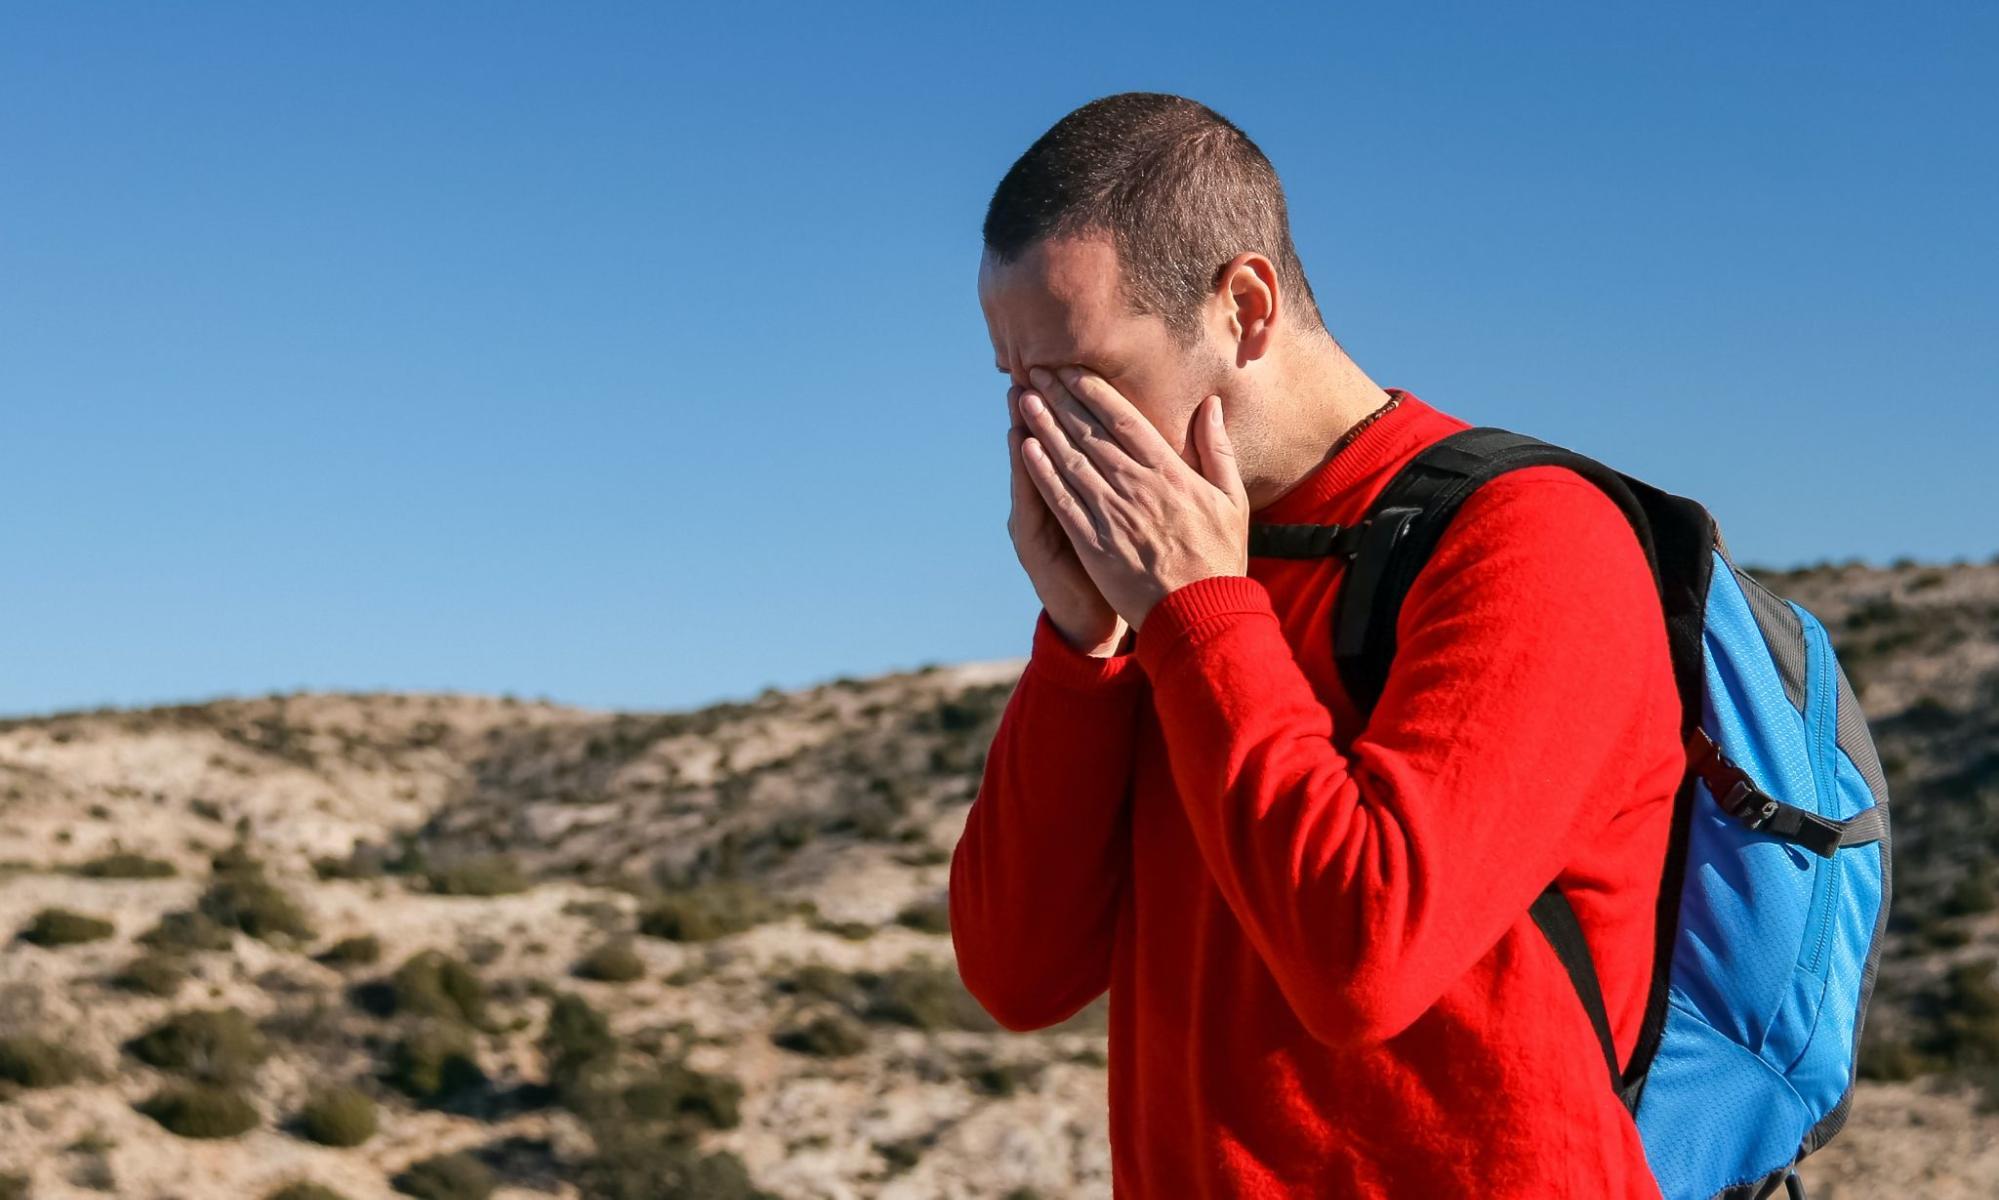 Meniere's disease: facing the fear of hearing loss